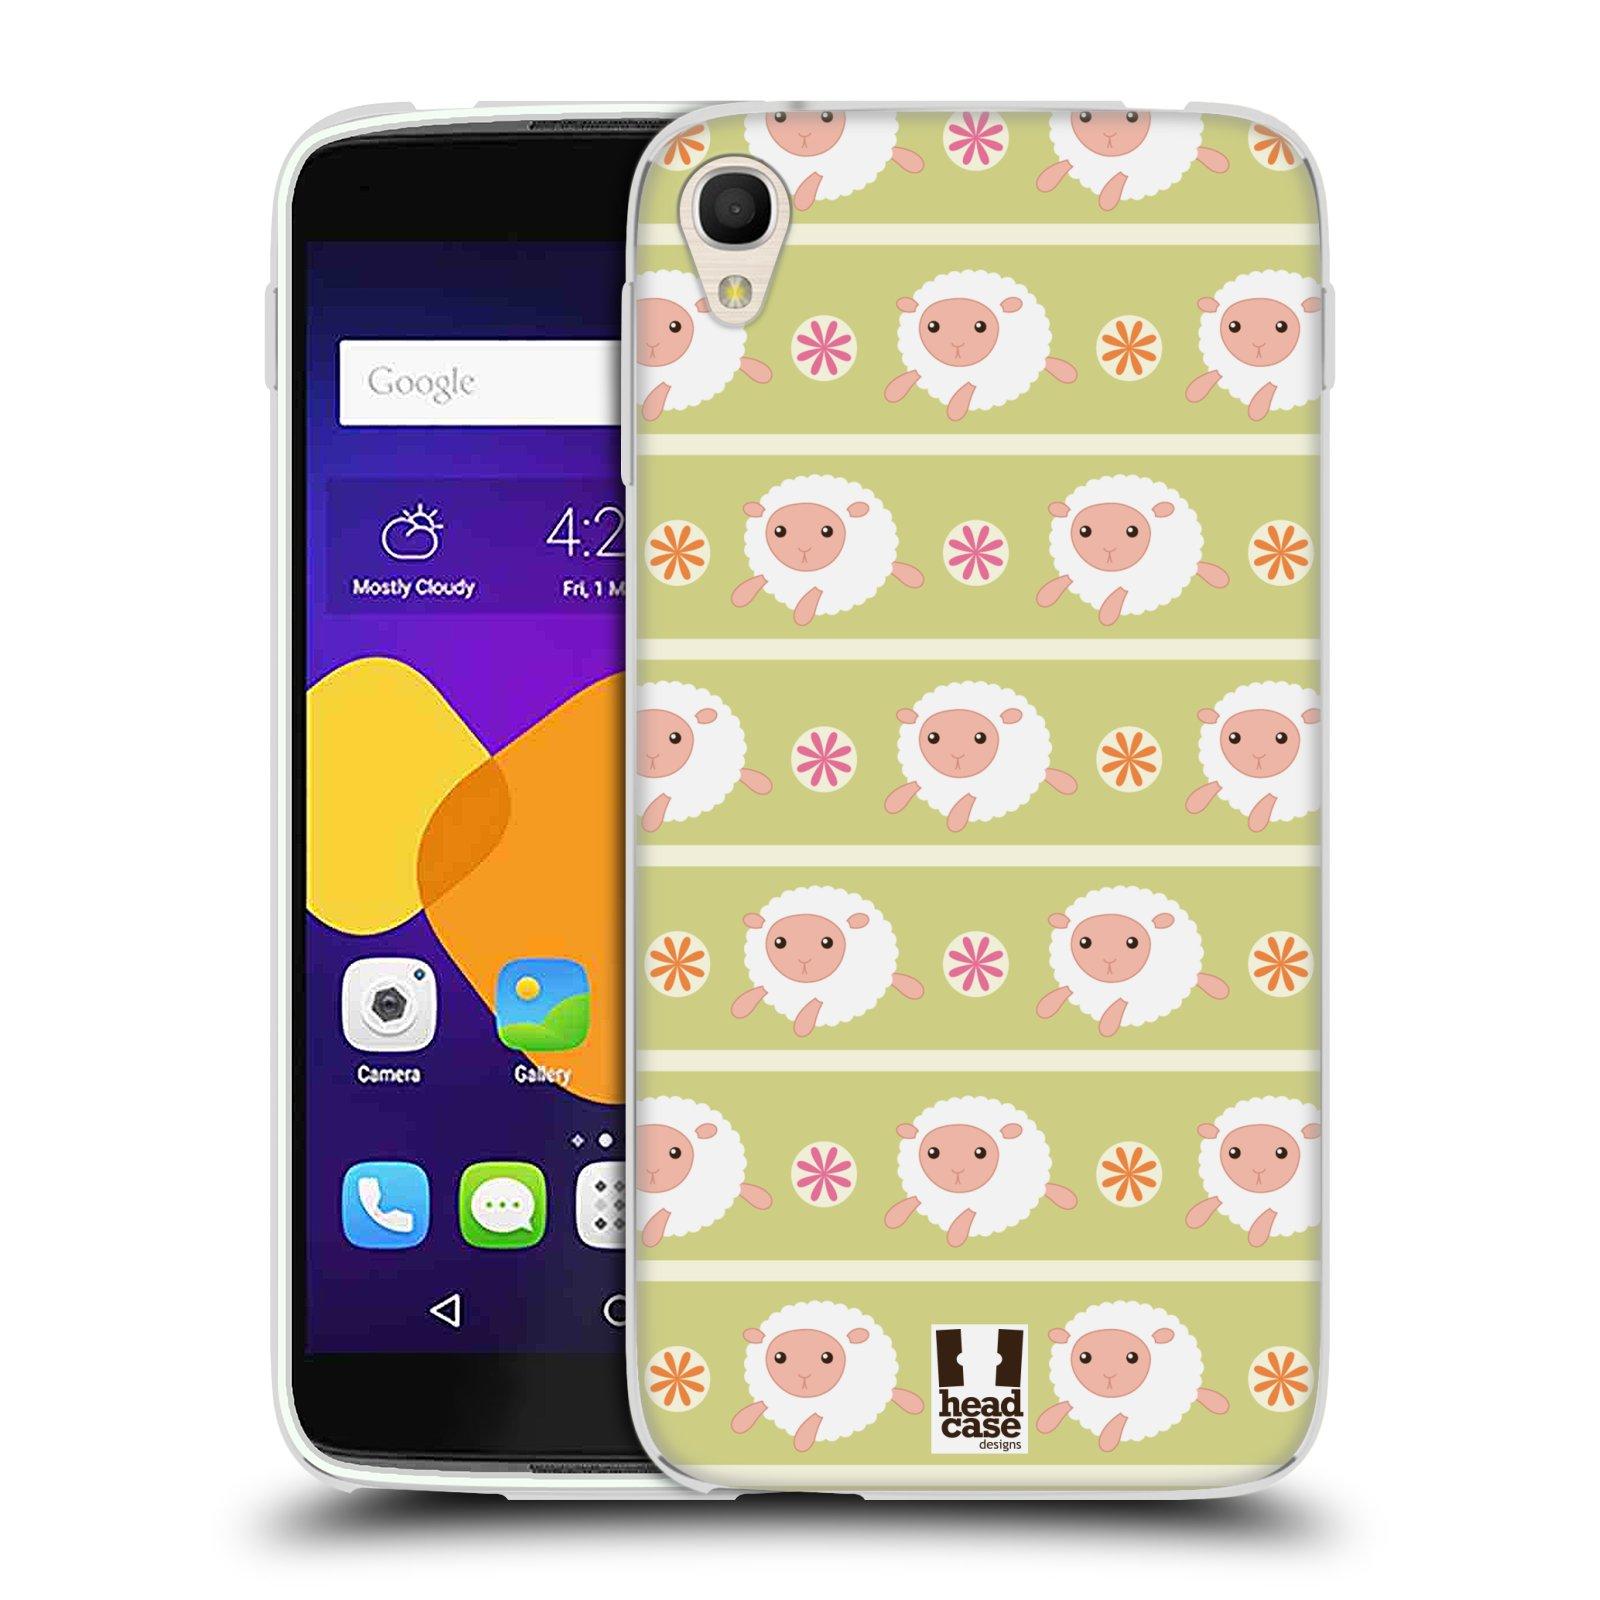 HEAD CASE silikonový obal na mobil Alcatel Idol 3 OT-6045Y (5.5) vzor roztomilé zvířecí vzory ovečky